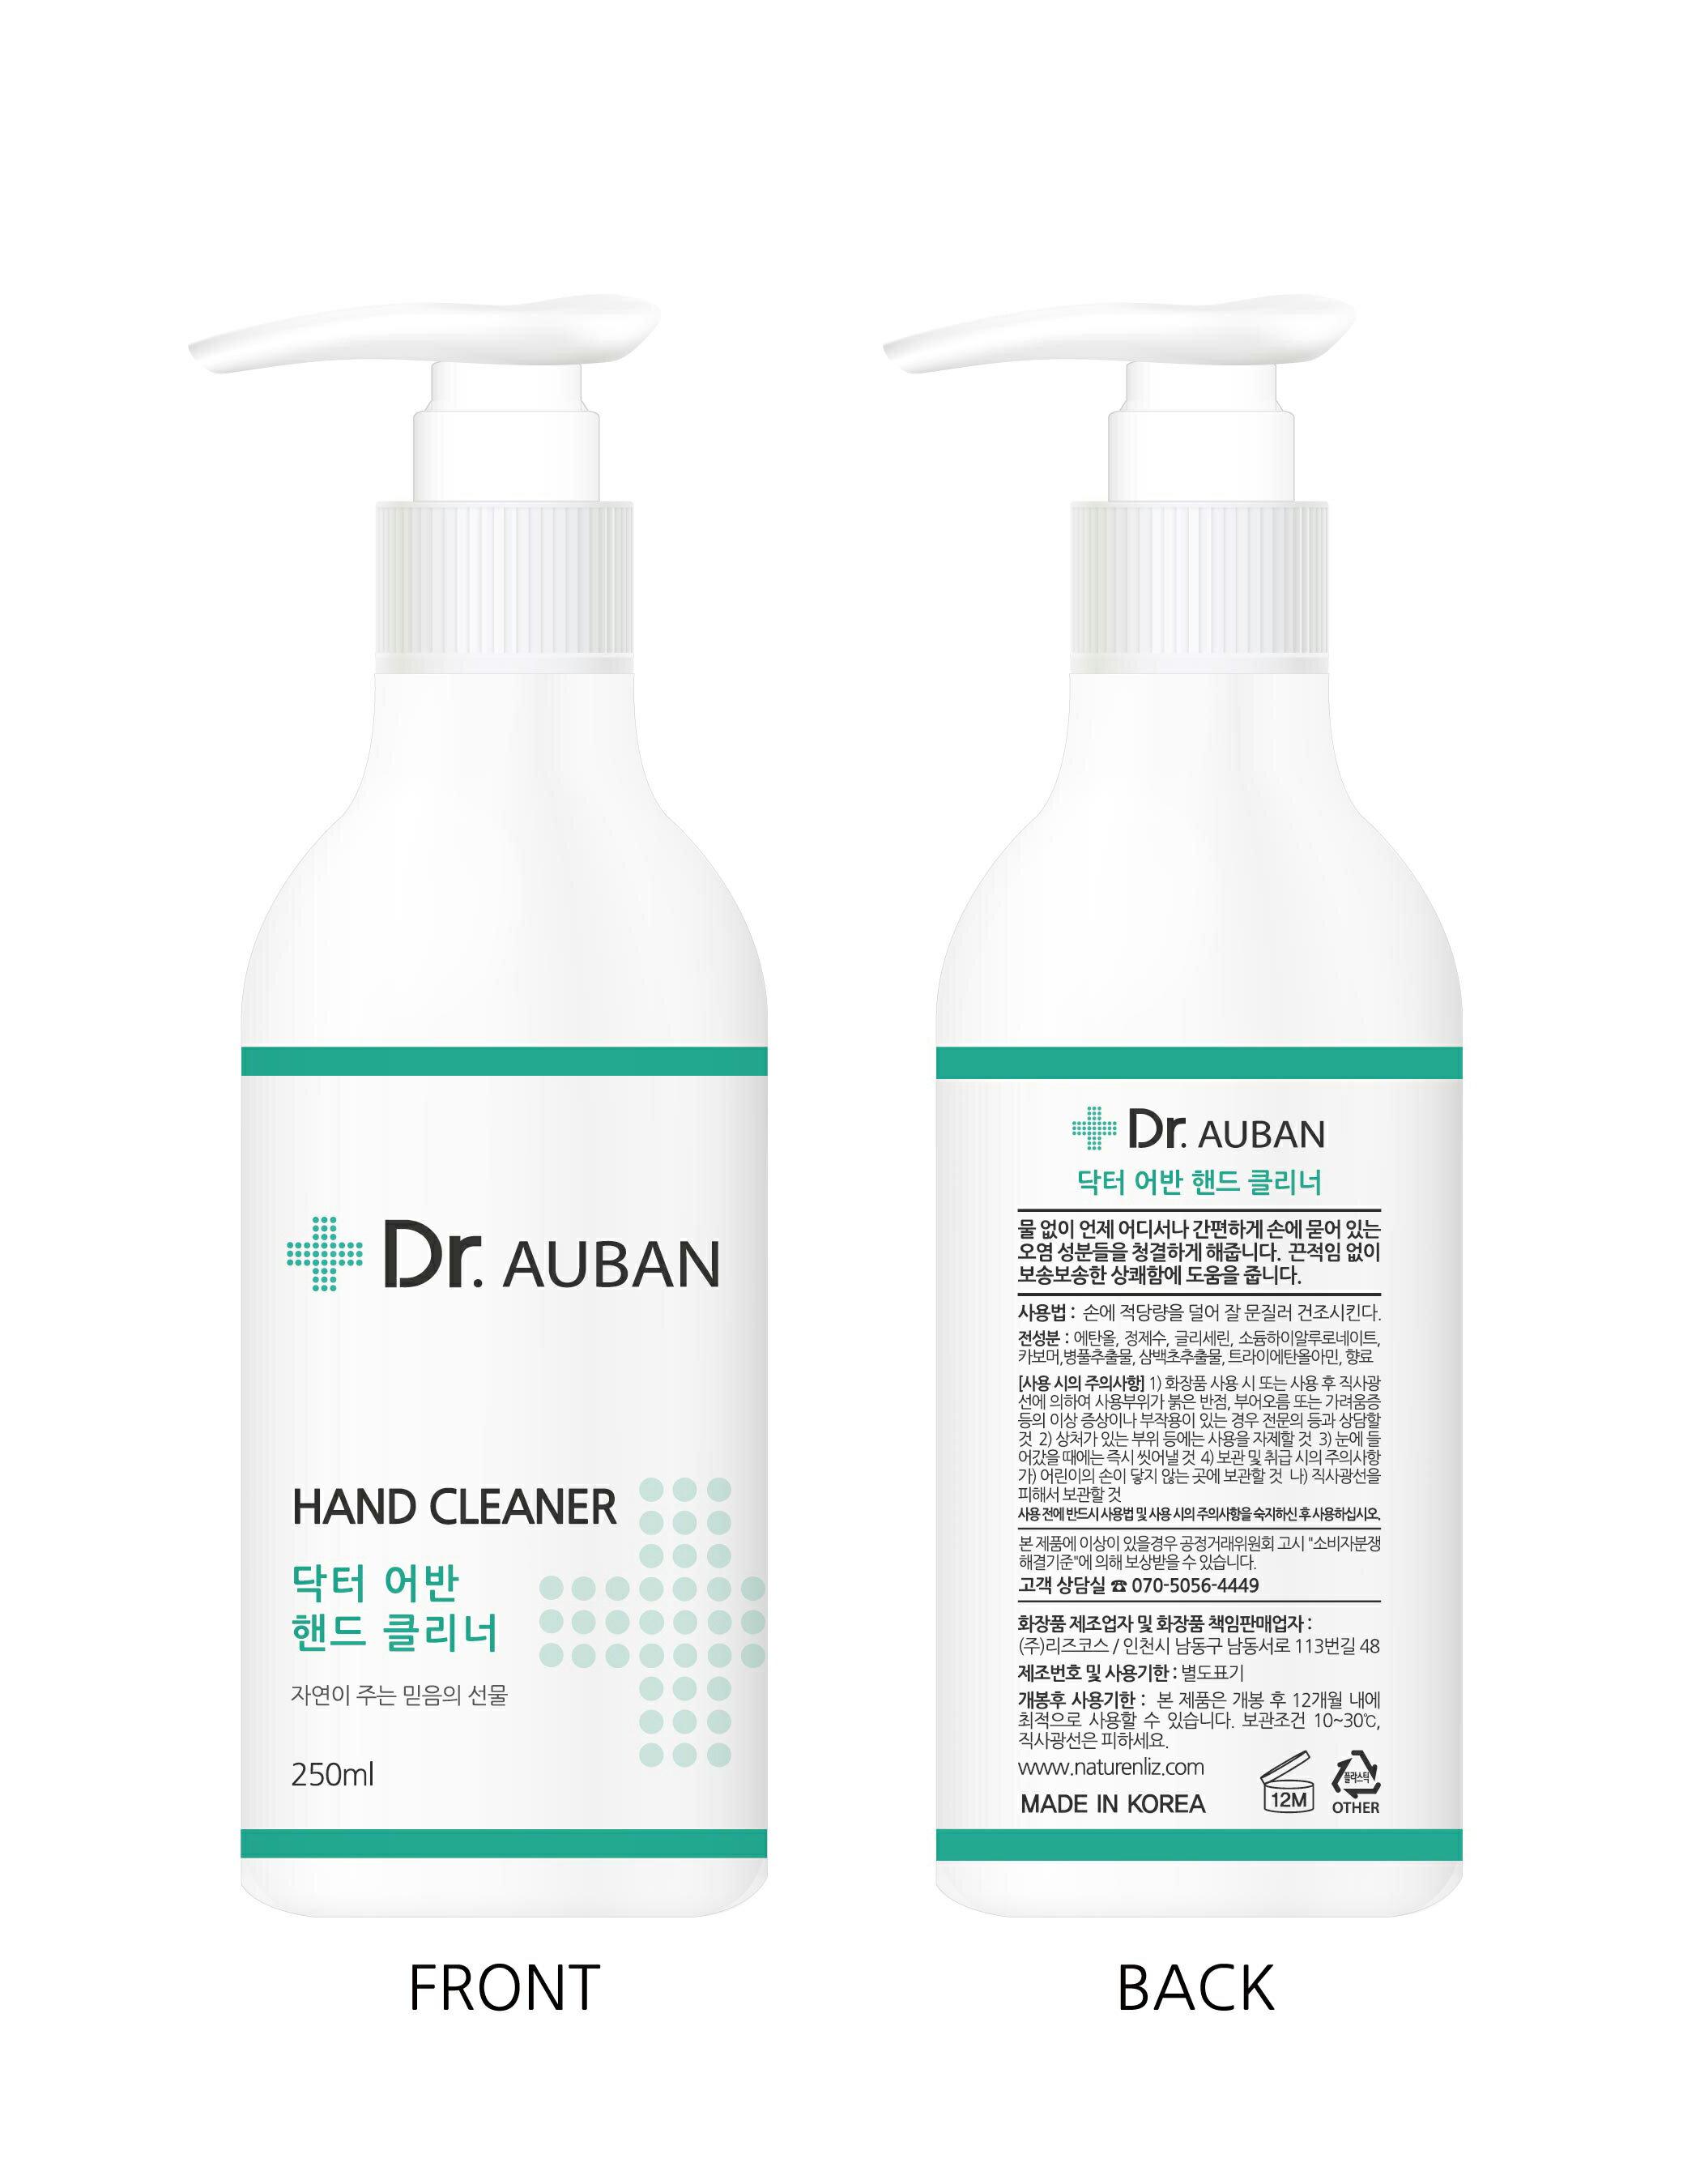 Dr. AUBAN 酒精乾洗手凝膠